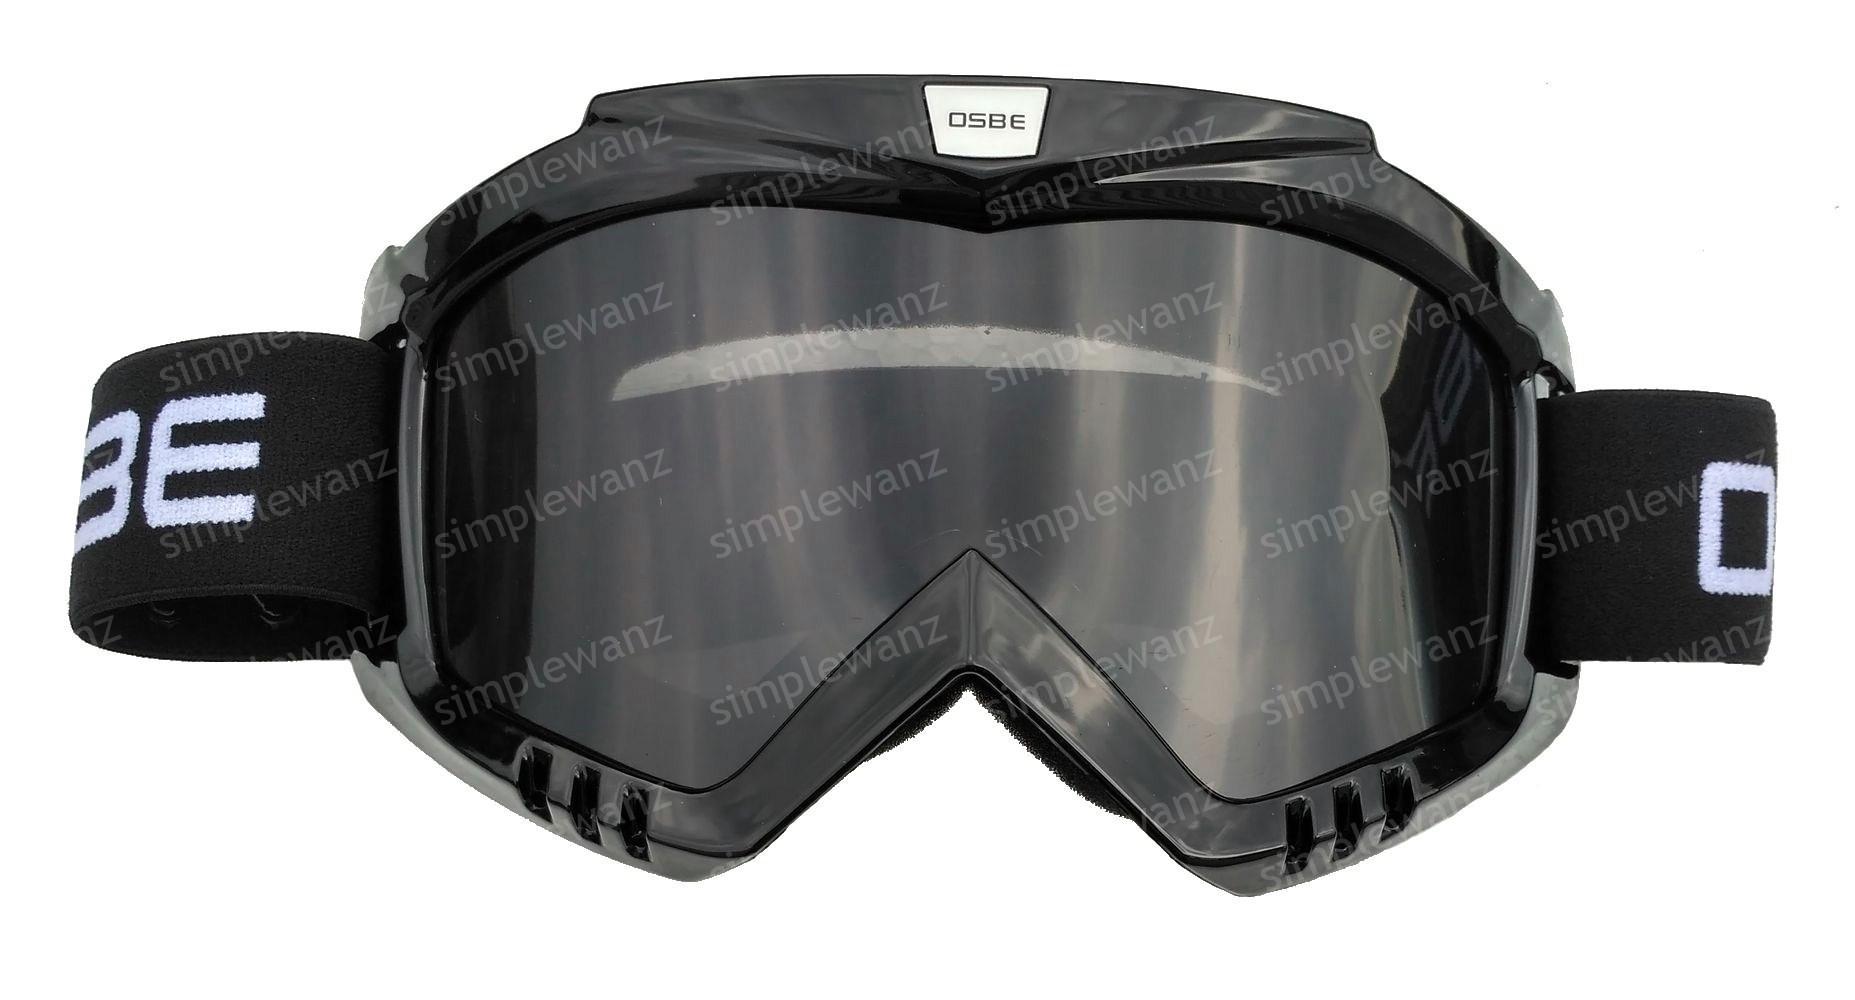 Kacamata Goggle Motocross Trail OSBE Rainbow Google Silver Lens Pelangi 8cb07eec4c